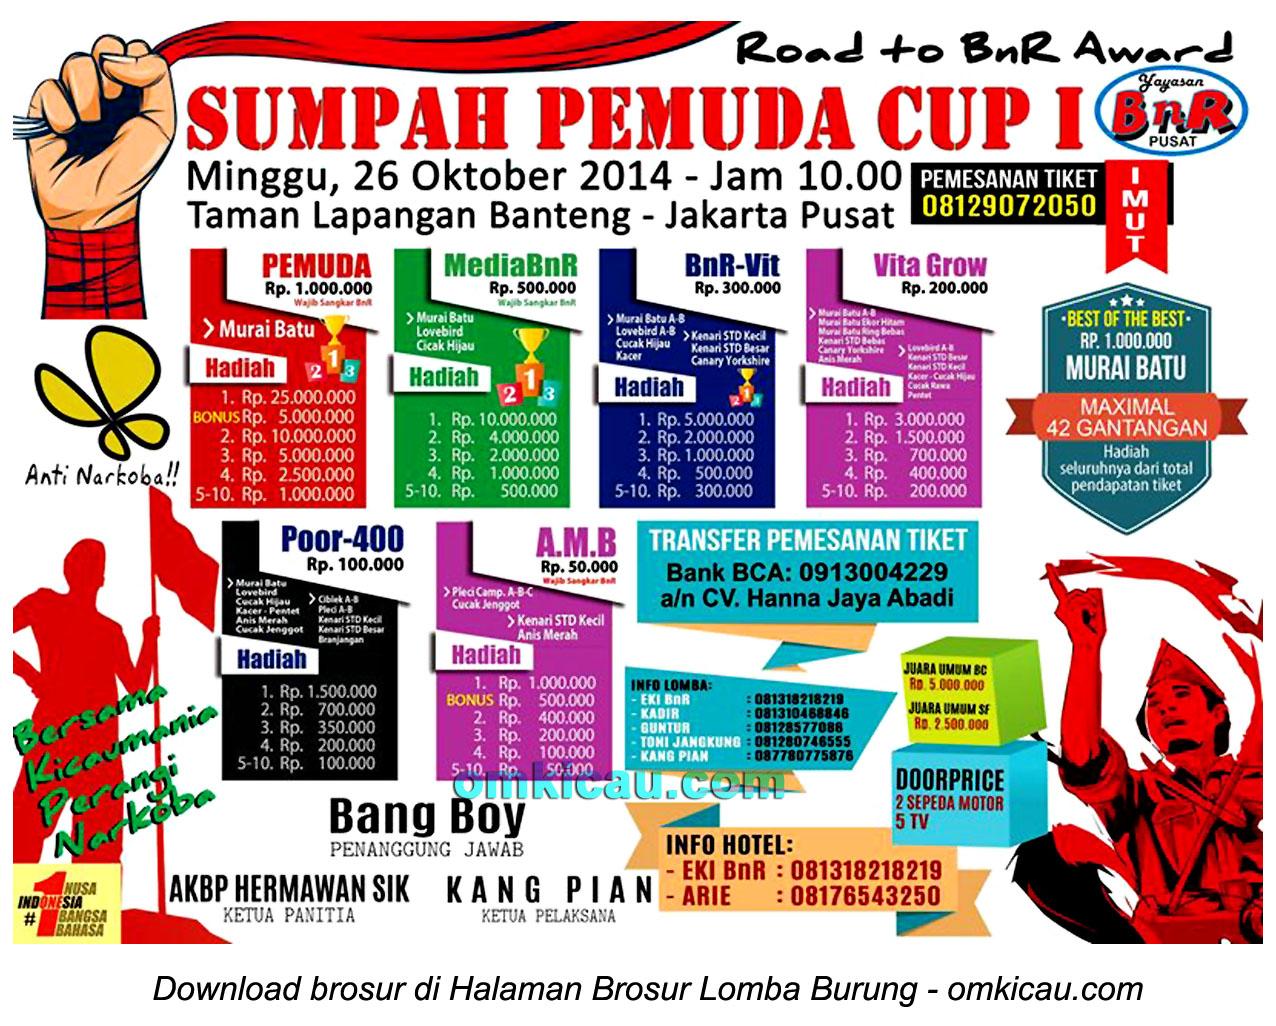 Brosur Lomba Burung Berkicau Sumpah Pemuda Cup I, Jakarta, 26 Oktober 2014